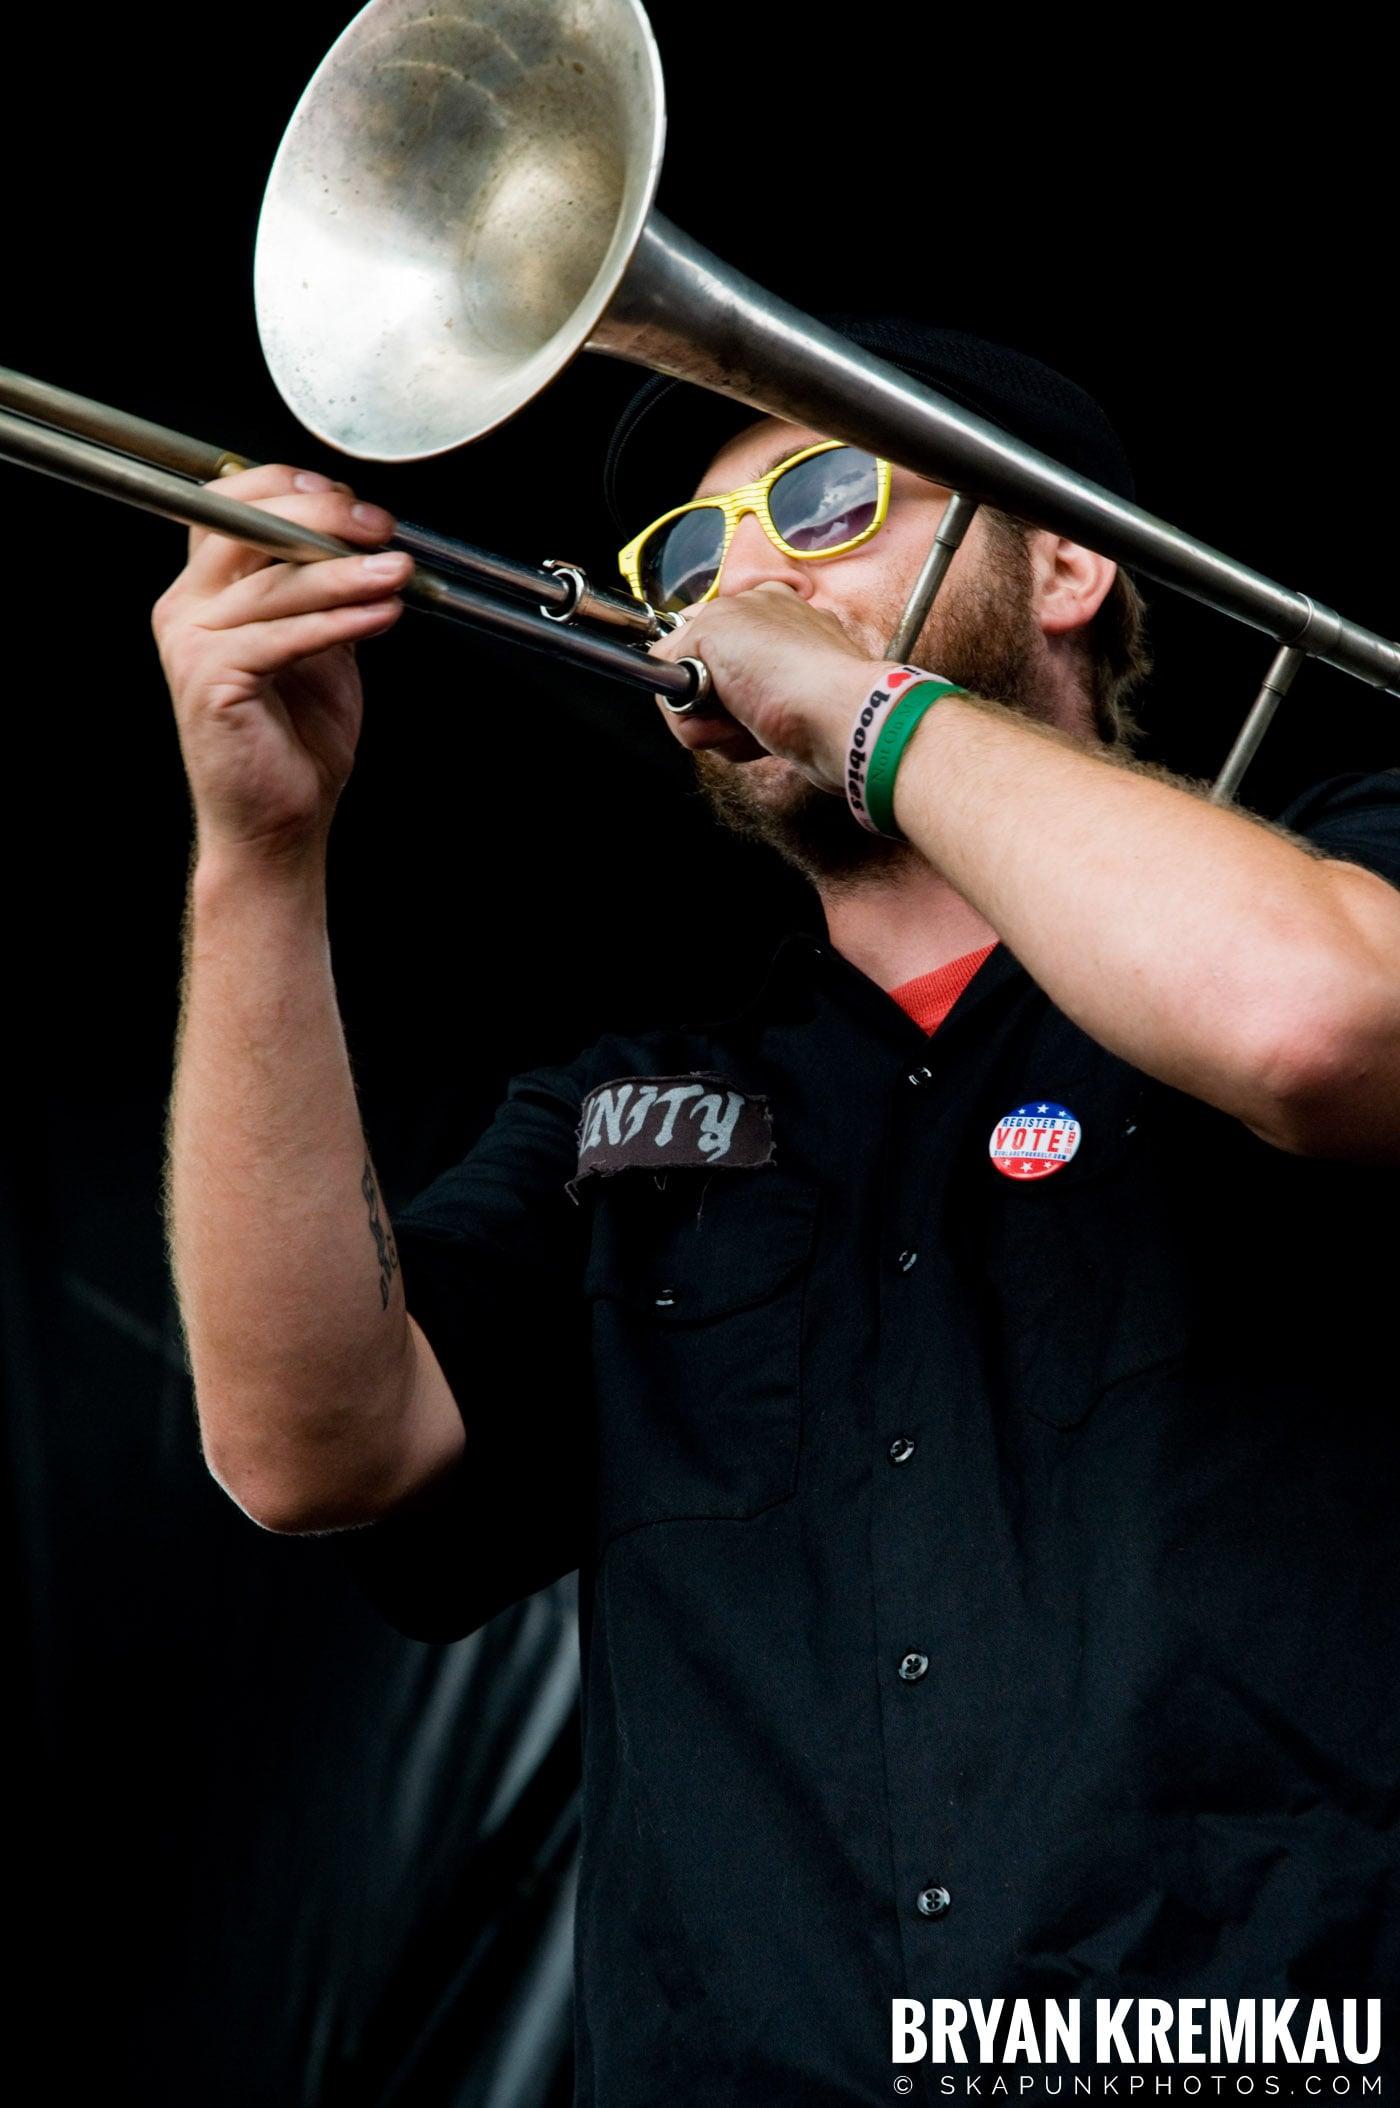 Reel Big Fish @ Warped Tour 08, Scranton PA - 7.27.08 (1)